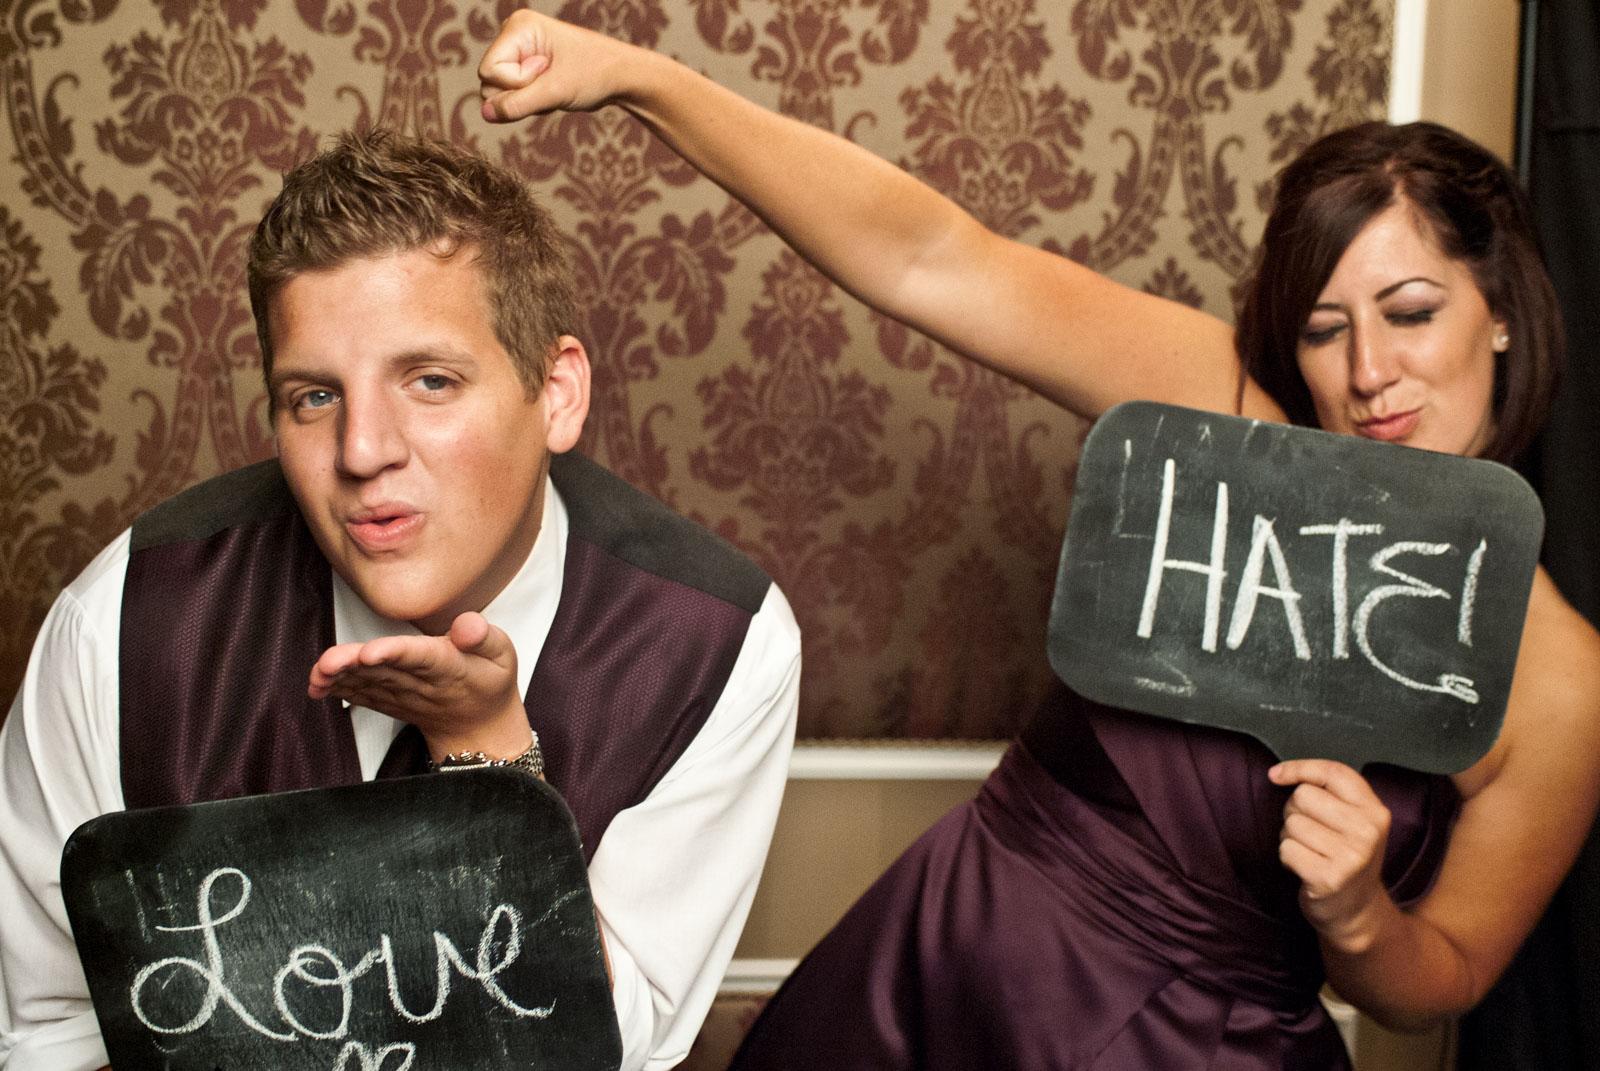 Wedding040_Saland061210384.jpg